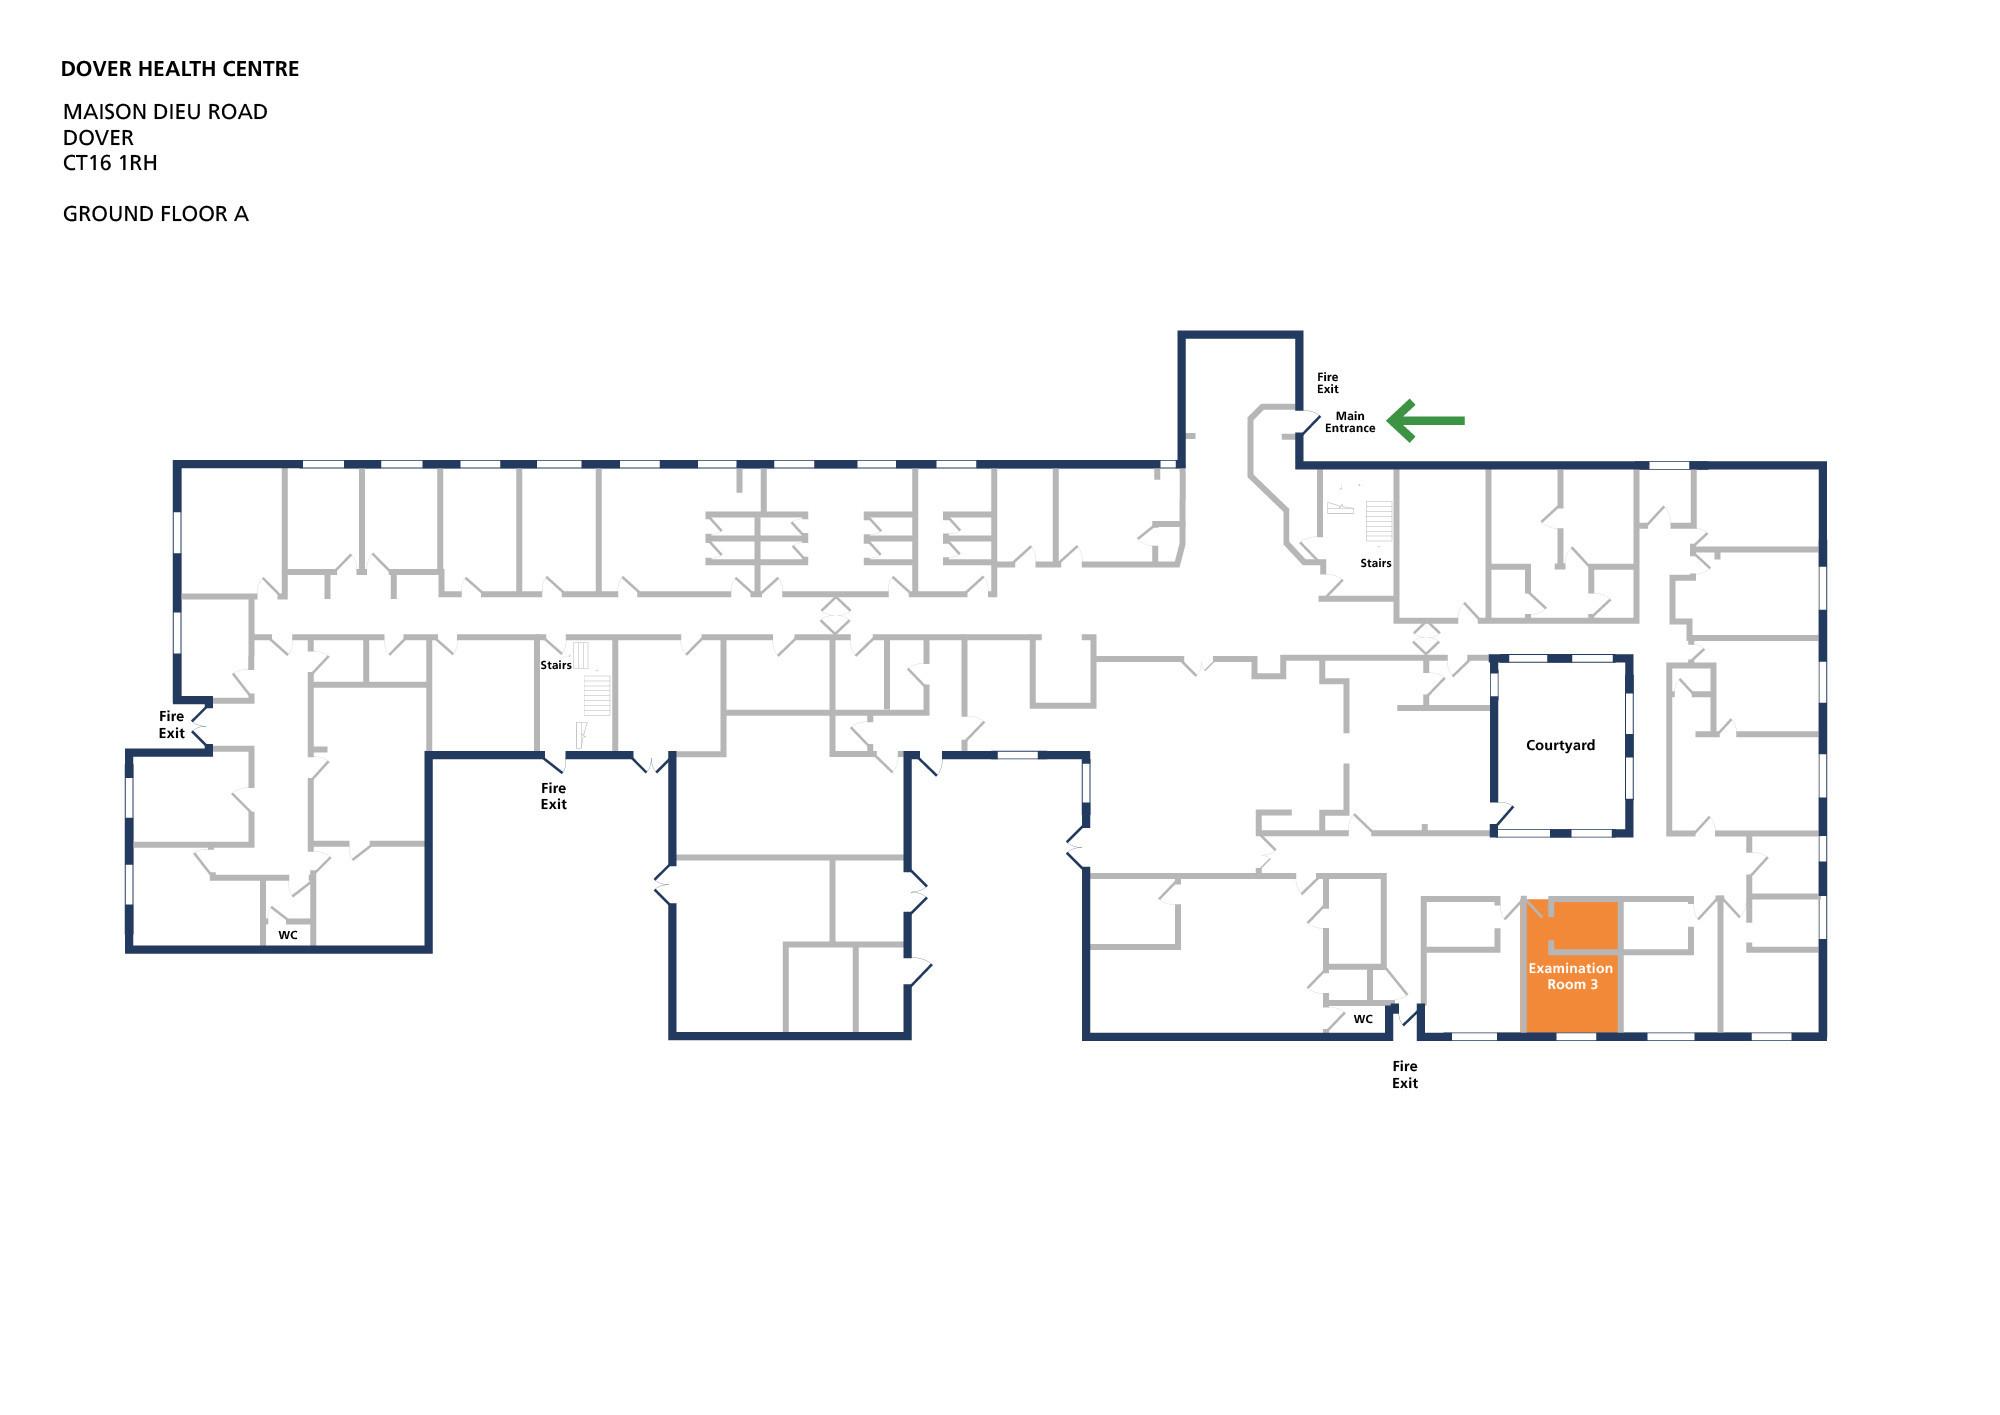 Dover health centre room examination room 3 v1